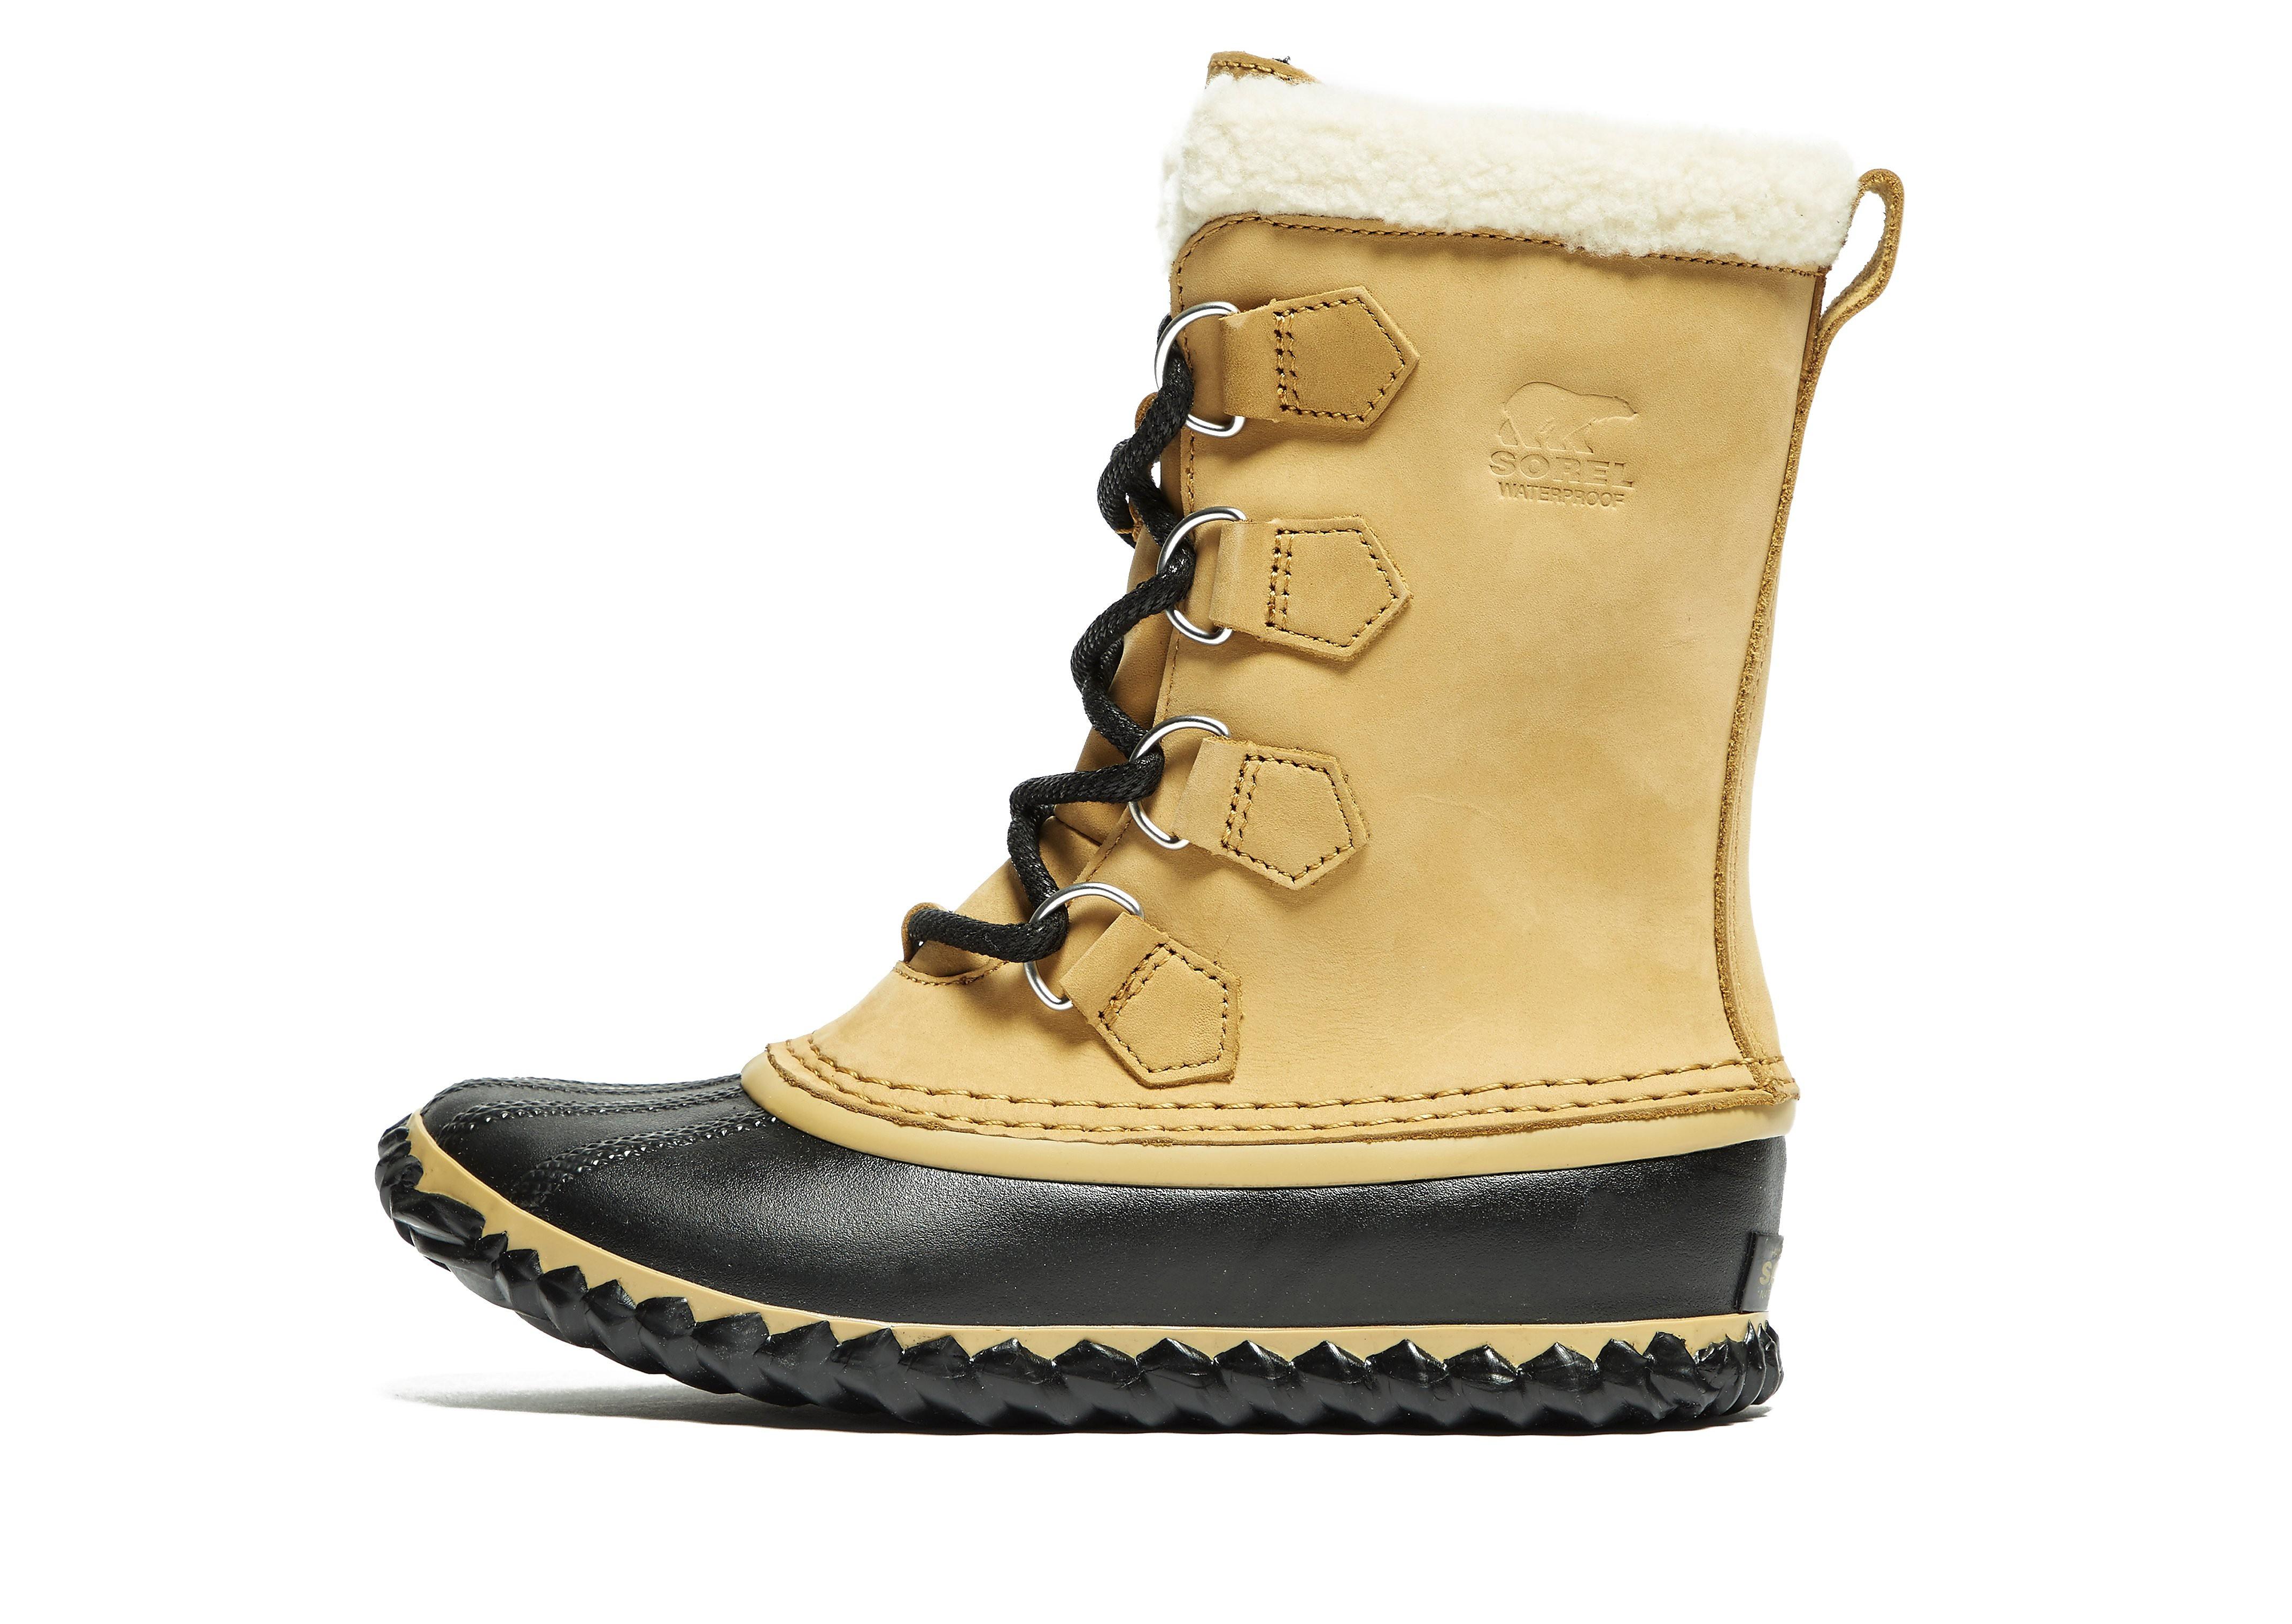 Sorel Caribou Slim Winter Snow Boot Women's